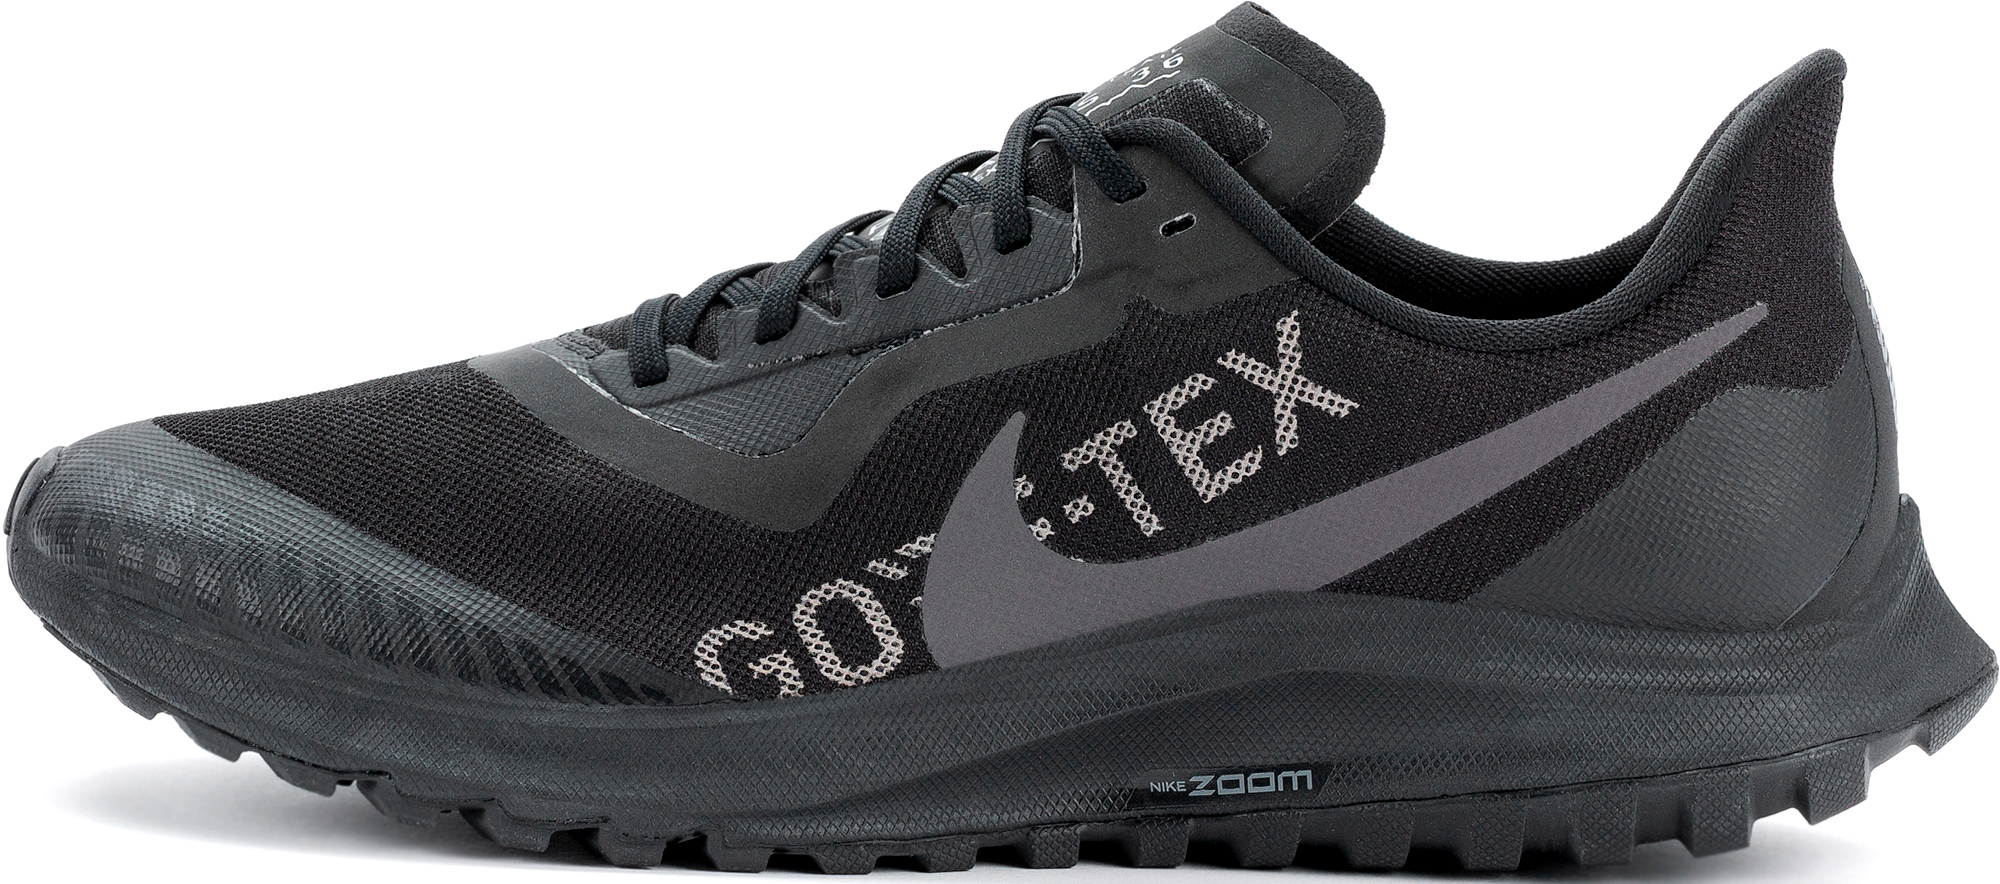 Nike Кроссовки мужские Zoom Pegasus 36 Trail, размер 46,5